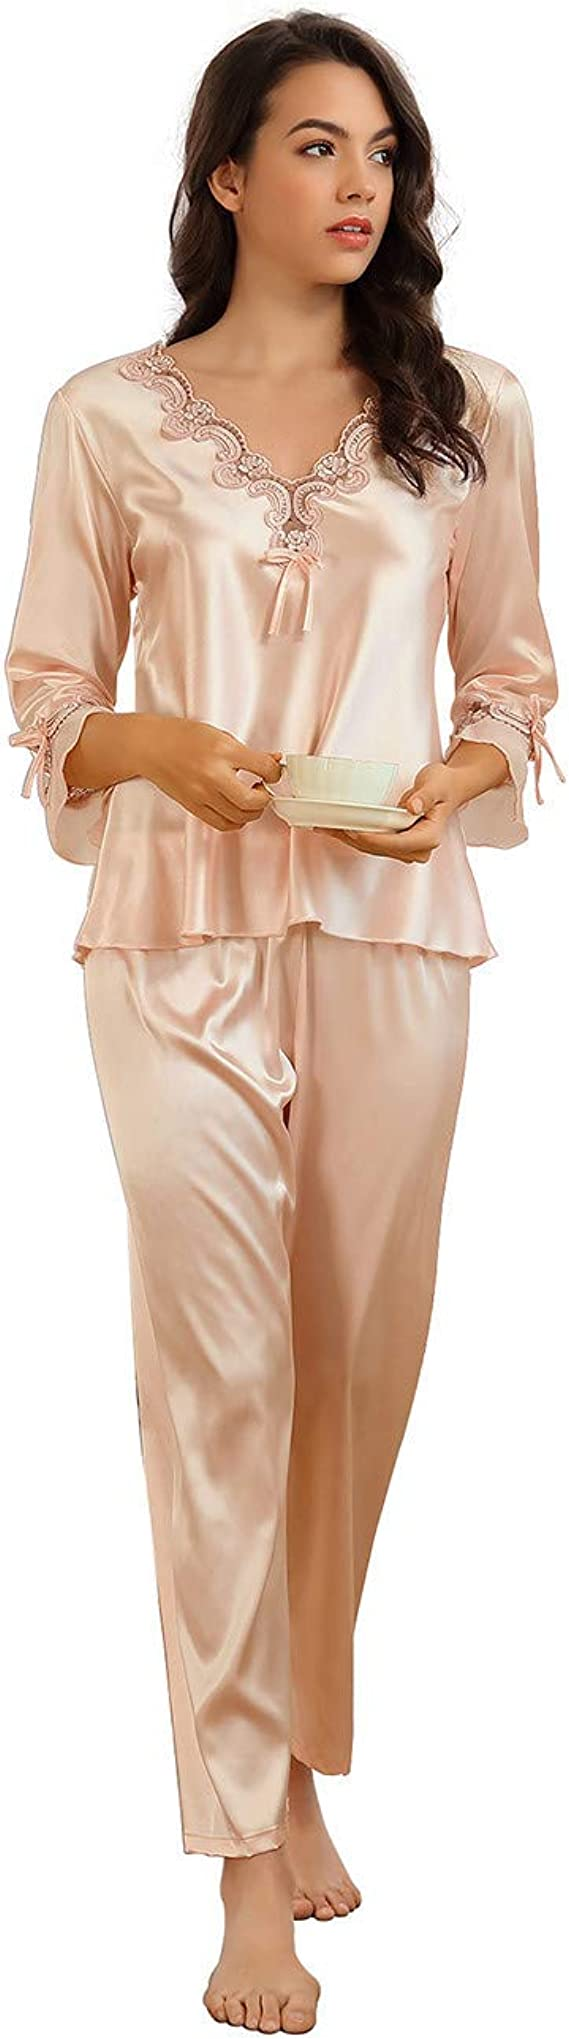 UK 1930s Dresses, Shoes, Clothing in the UK Ladies Pyjamas Set Silky Satin Pyjamas for Women Sleepwear Loungewear £17.99 AT vintagedancer.com